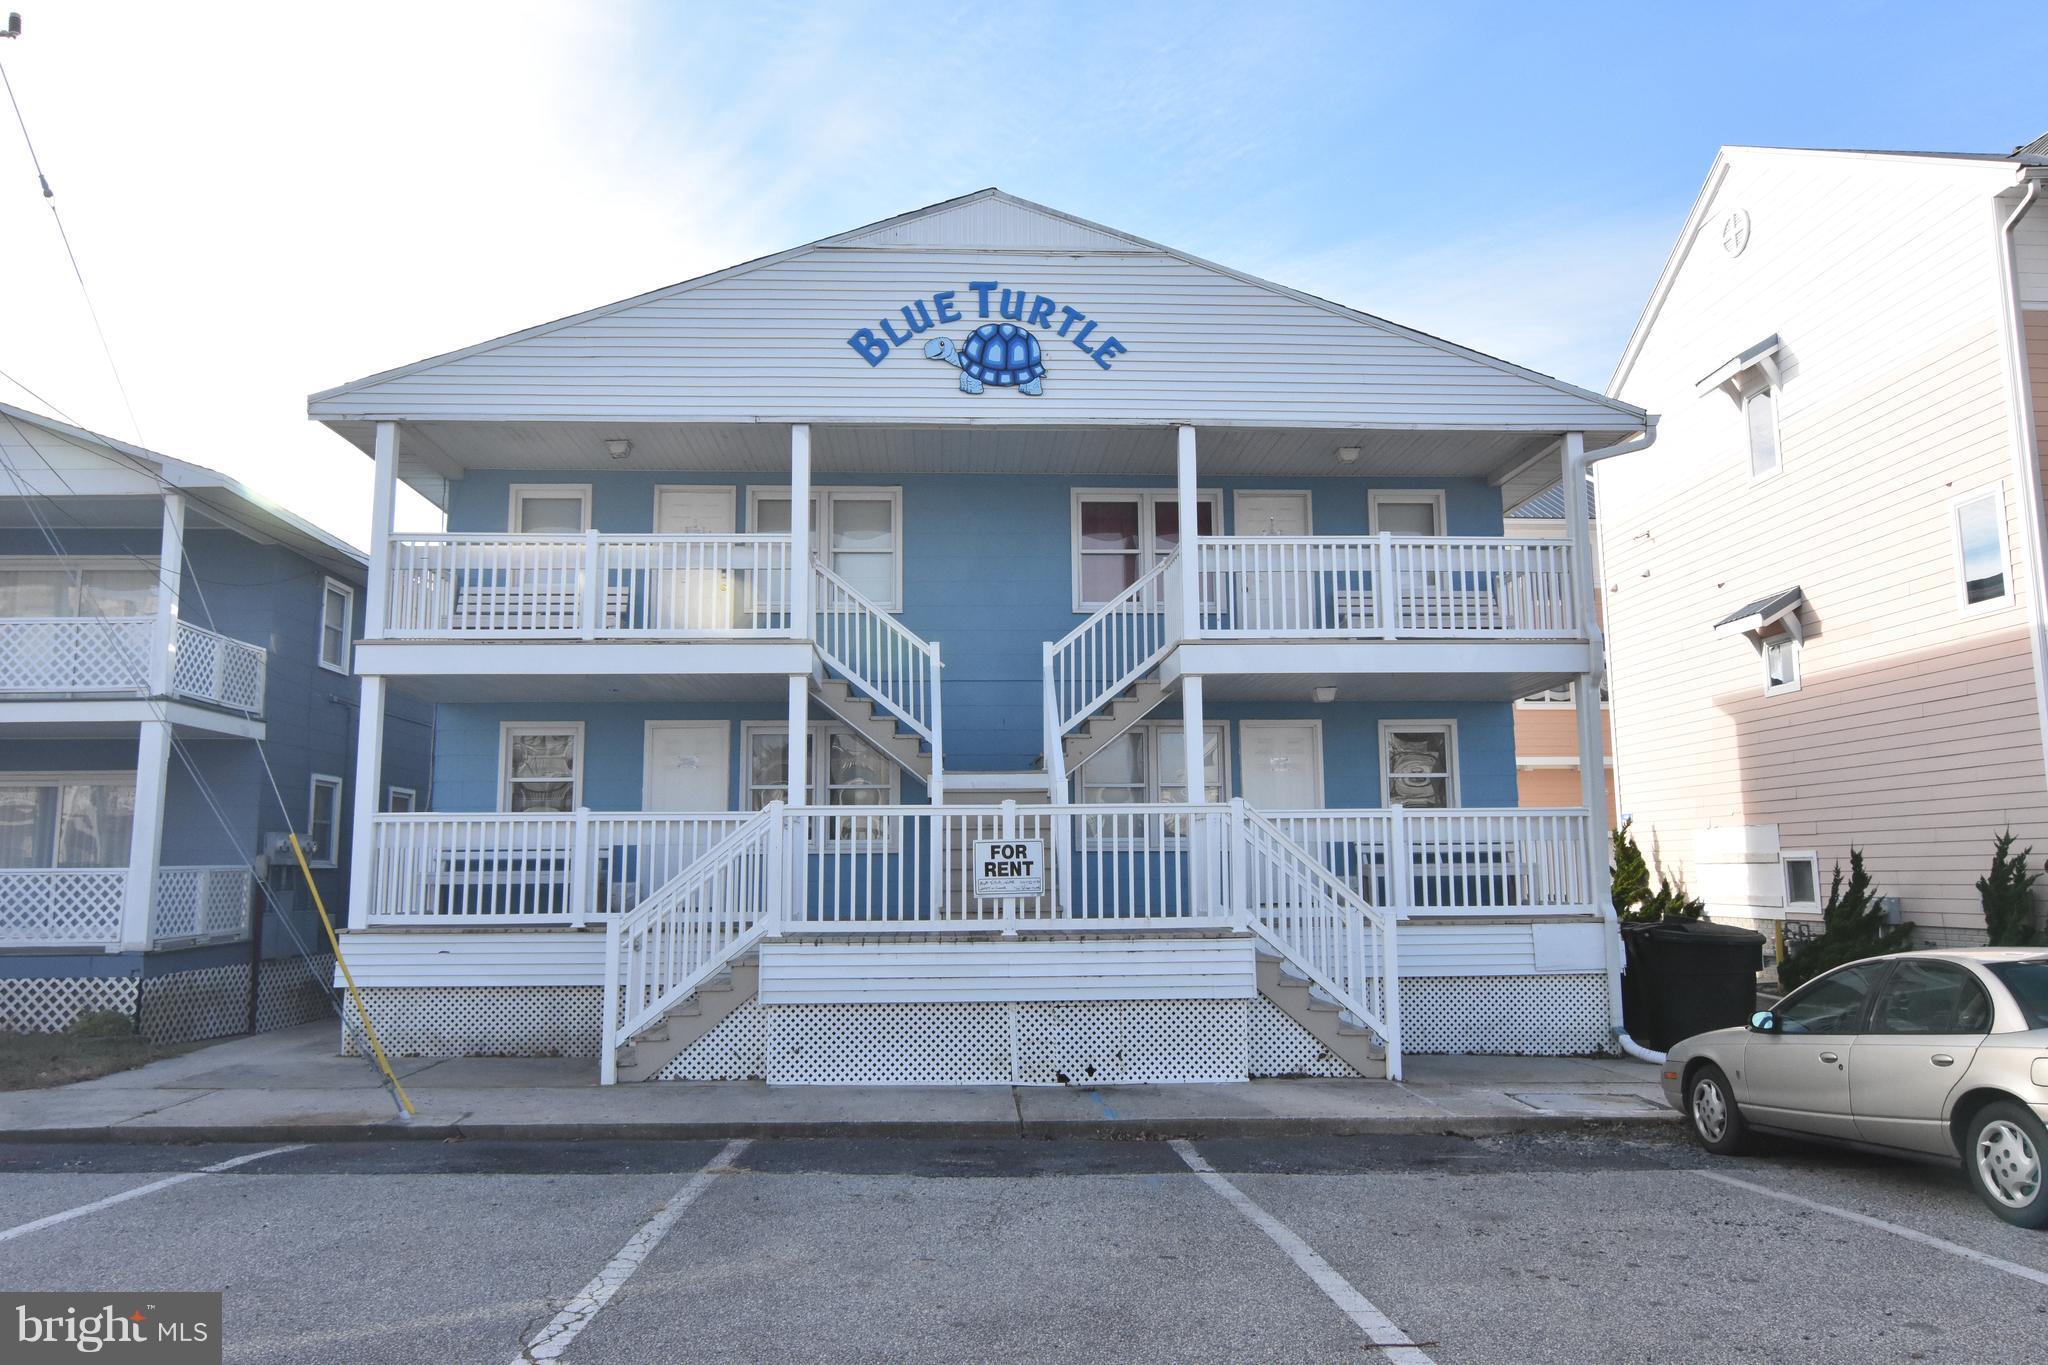 (Units 1-4 BLUE TURTLE BLDG) #15 57TH STREET, OCEAN CITY, MD 21842